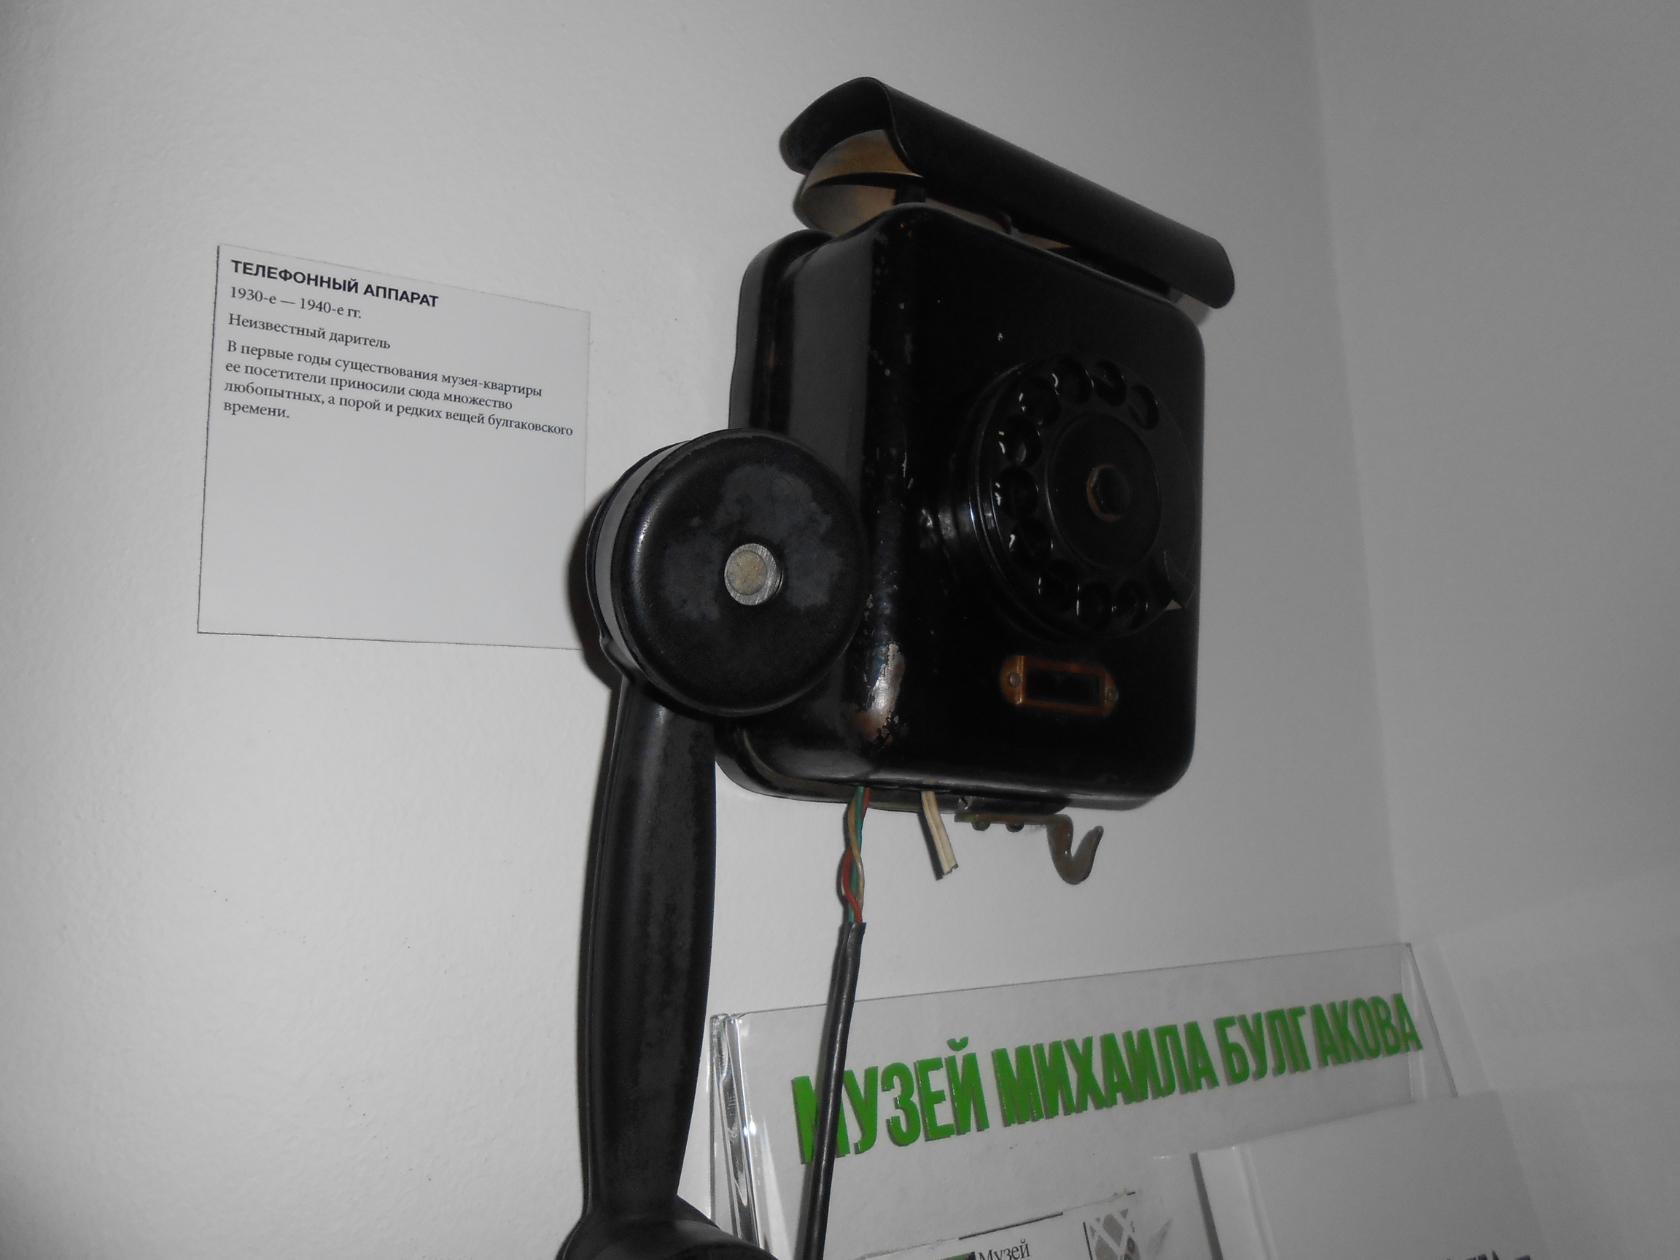 Музей Булгакова. Блиц: музейный экспонат